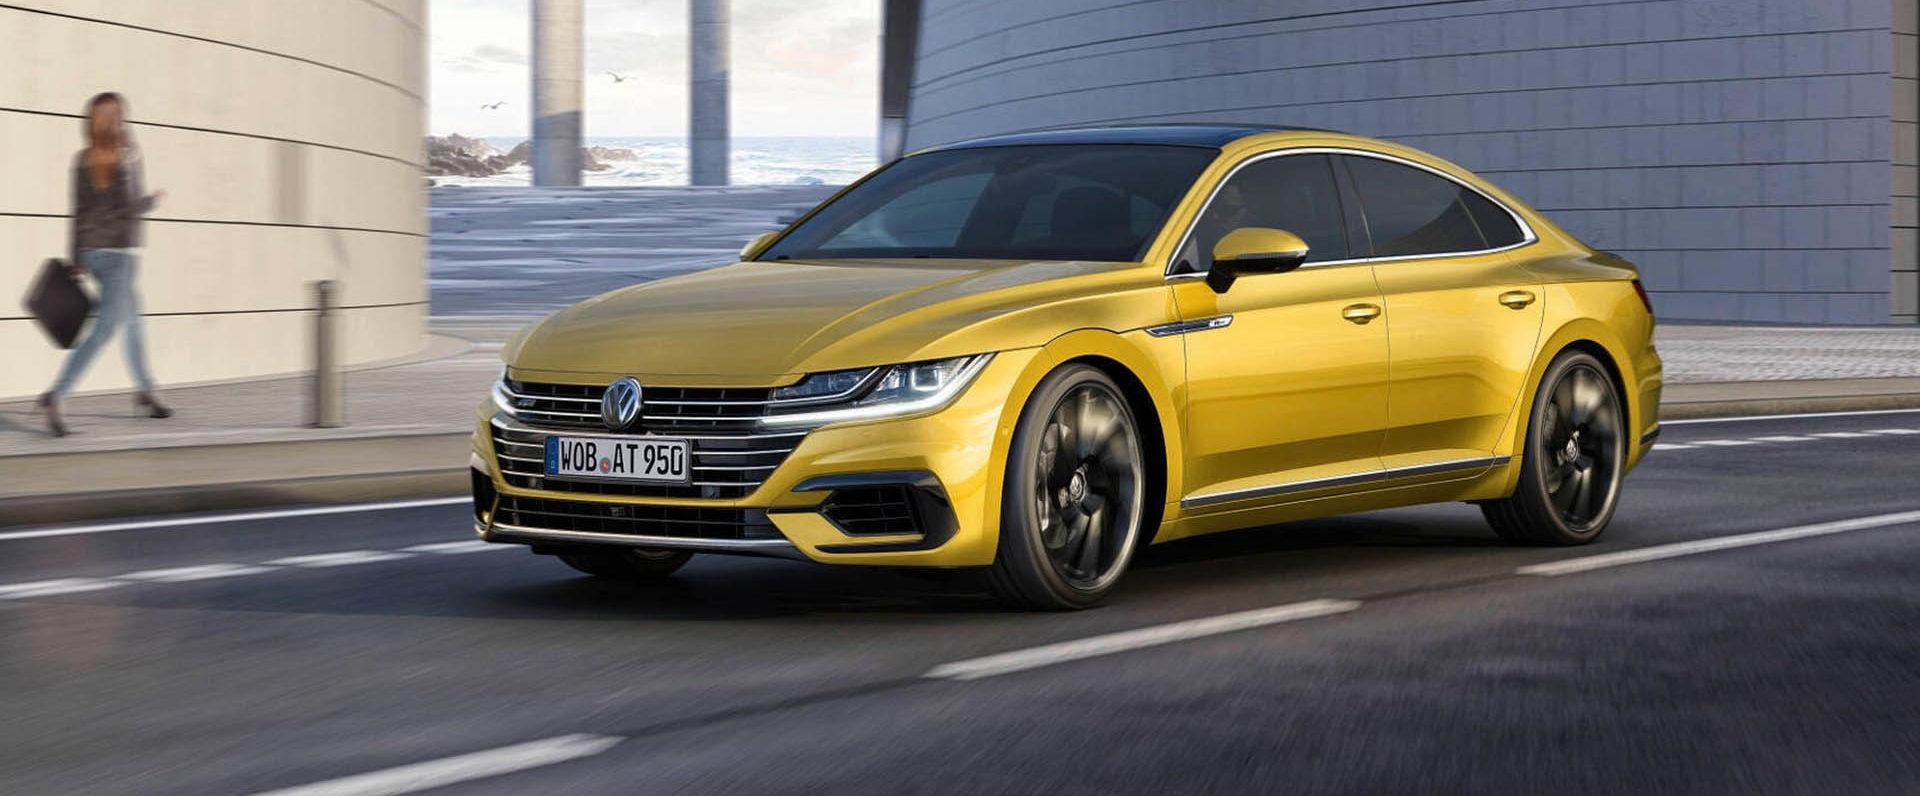 Volkswagen Arteon: Spoj avangarde i snažne dinamike